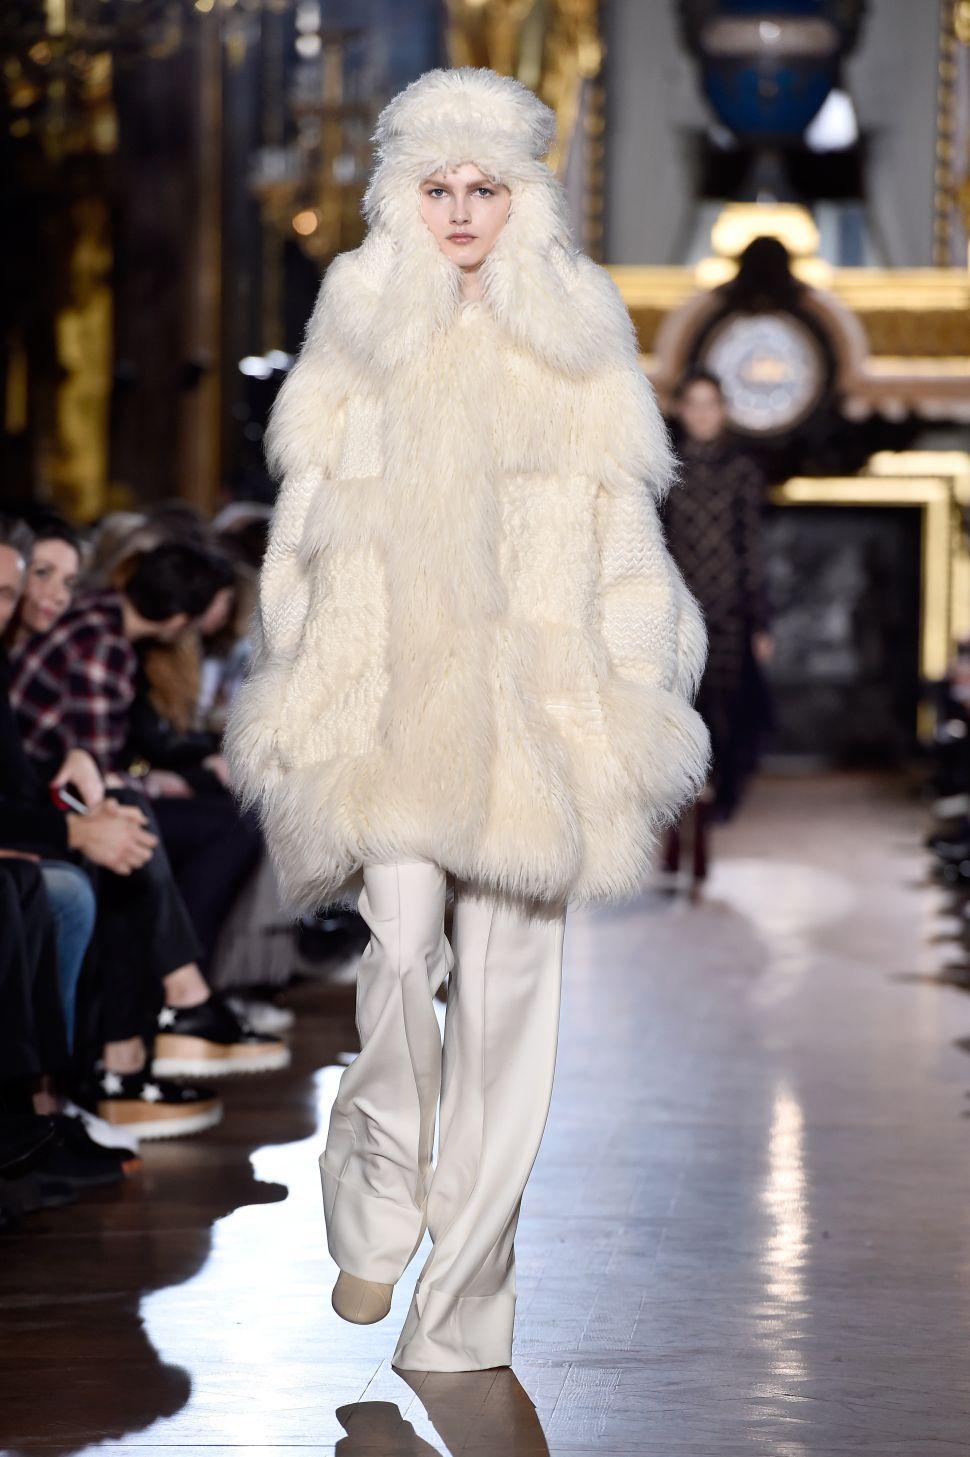 Lifelong Vegetarian Stella McCartney Debuts Faux Fur Coats, Refuses the Real Deal